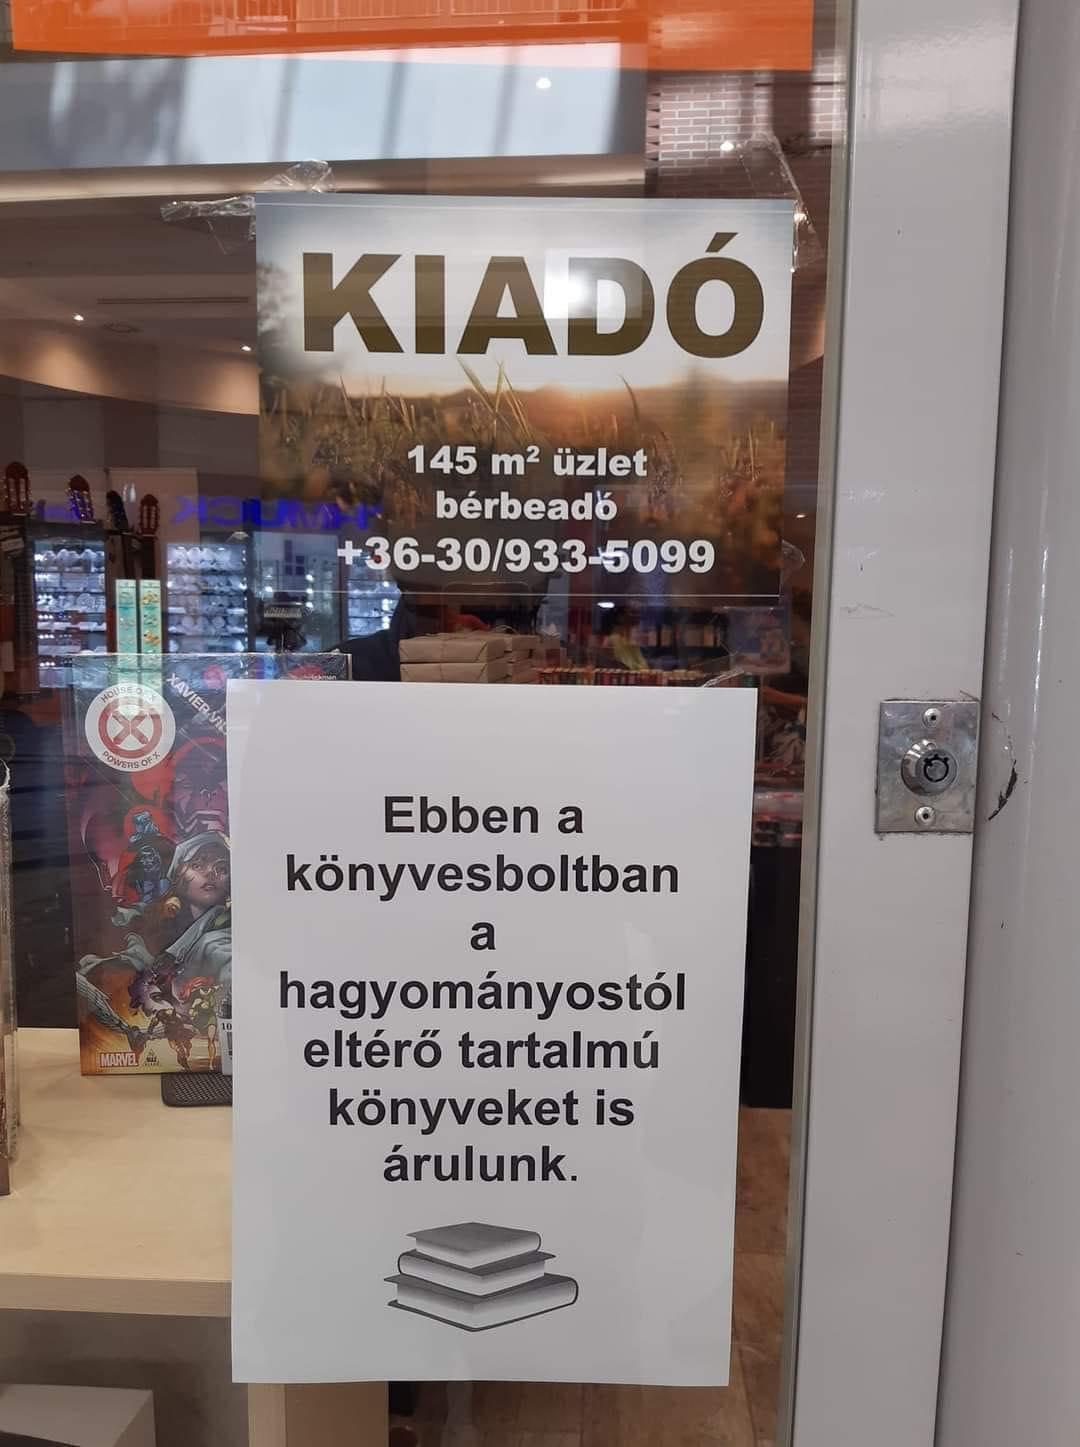 bérbeadó know)